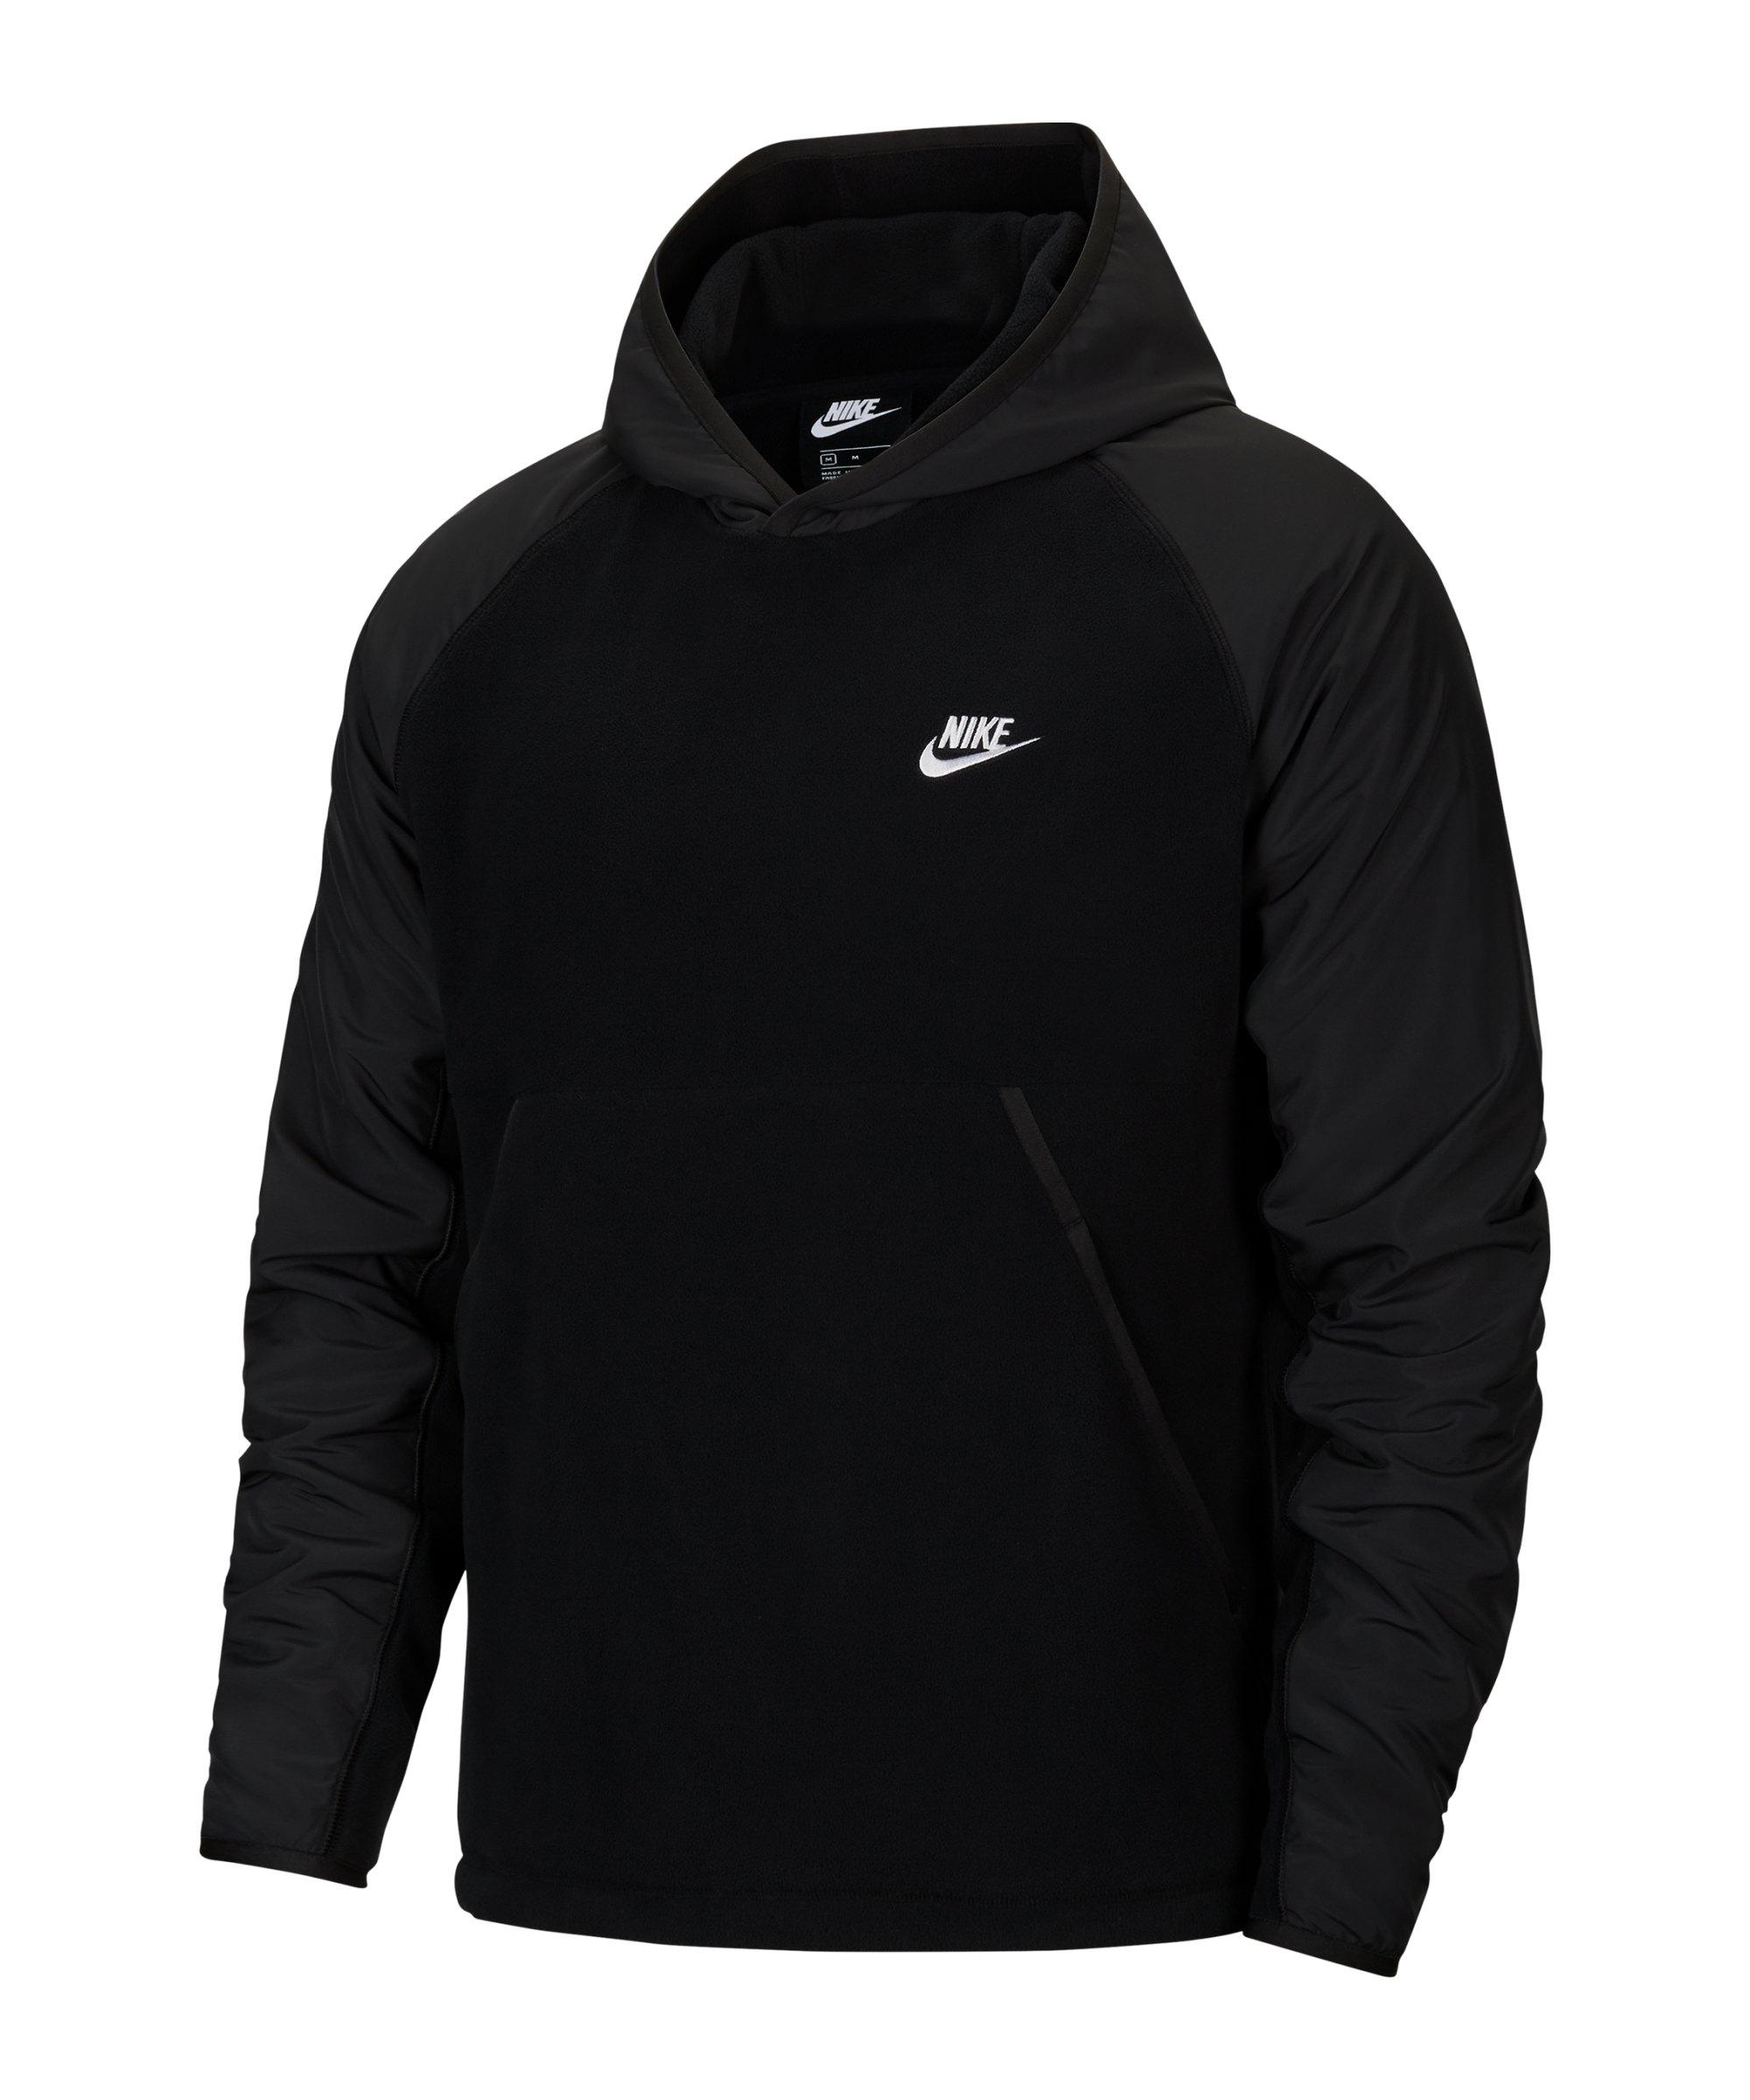 Nike Fleece Winter Hoody Schwarz F010 - schwarz